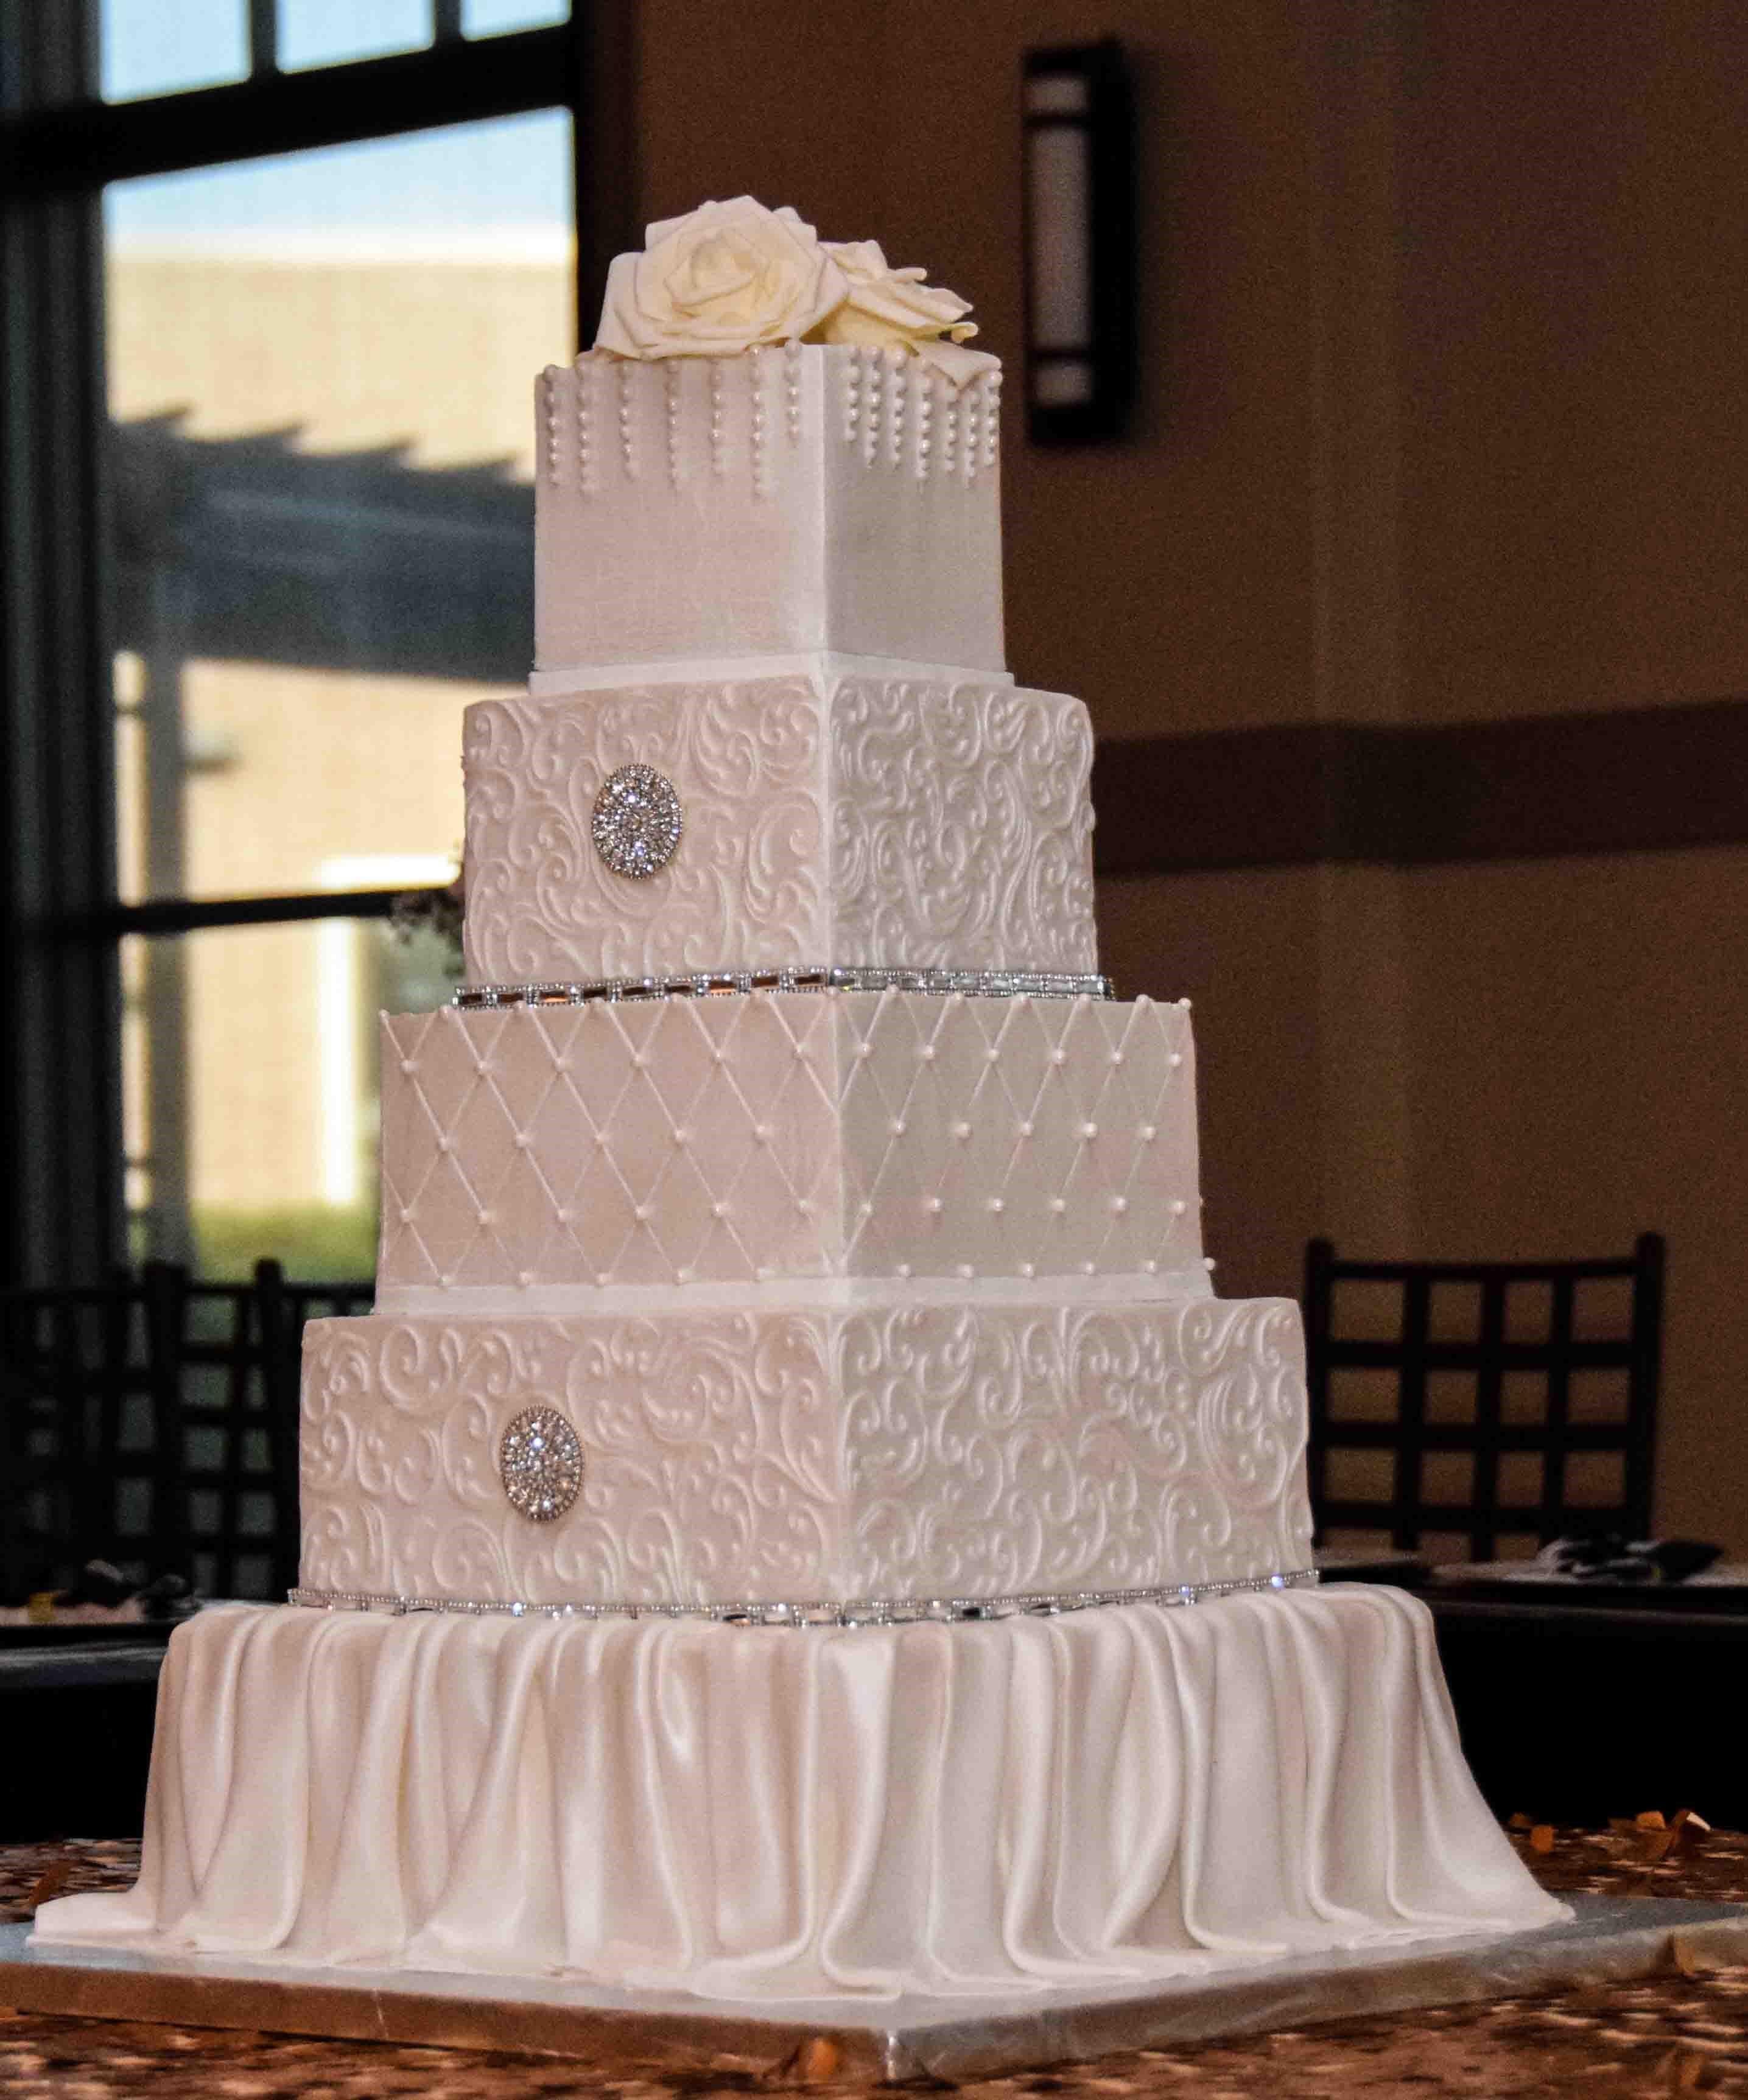 Wedding Cakes by Tammy Allen image 16